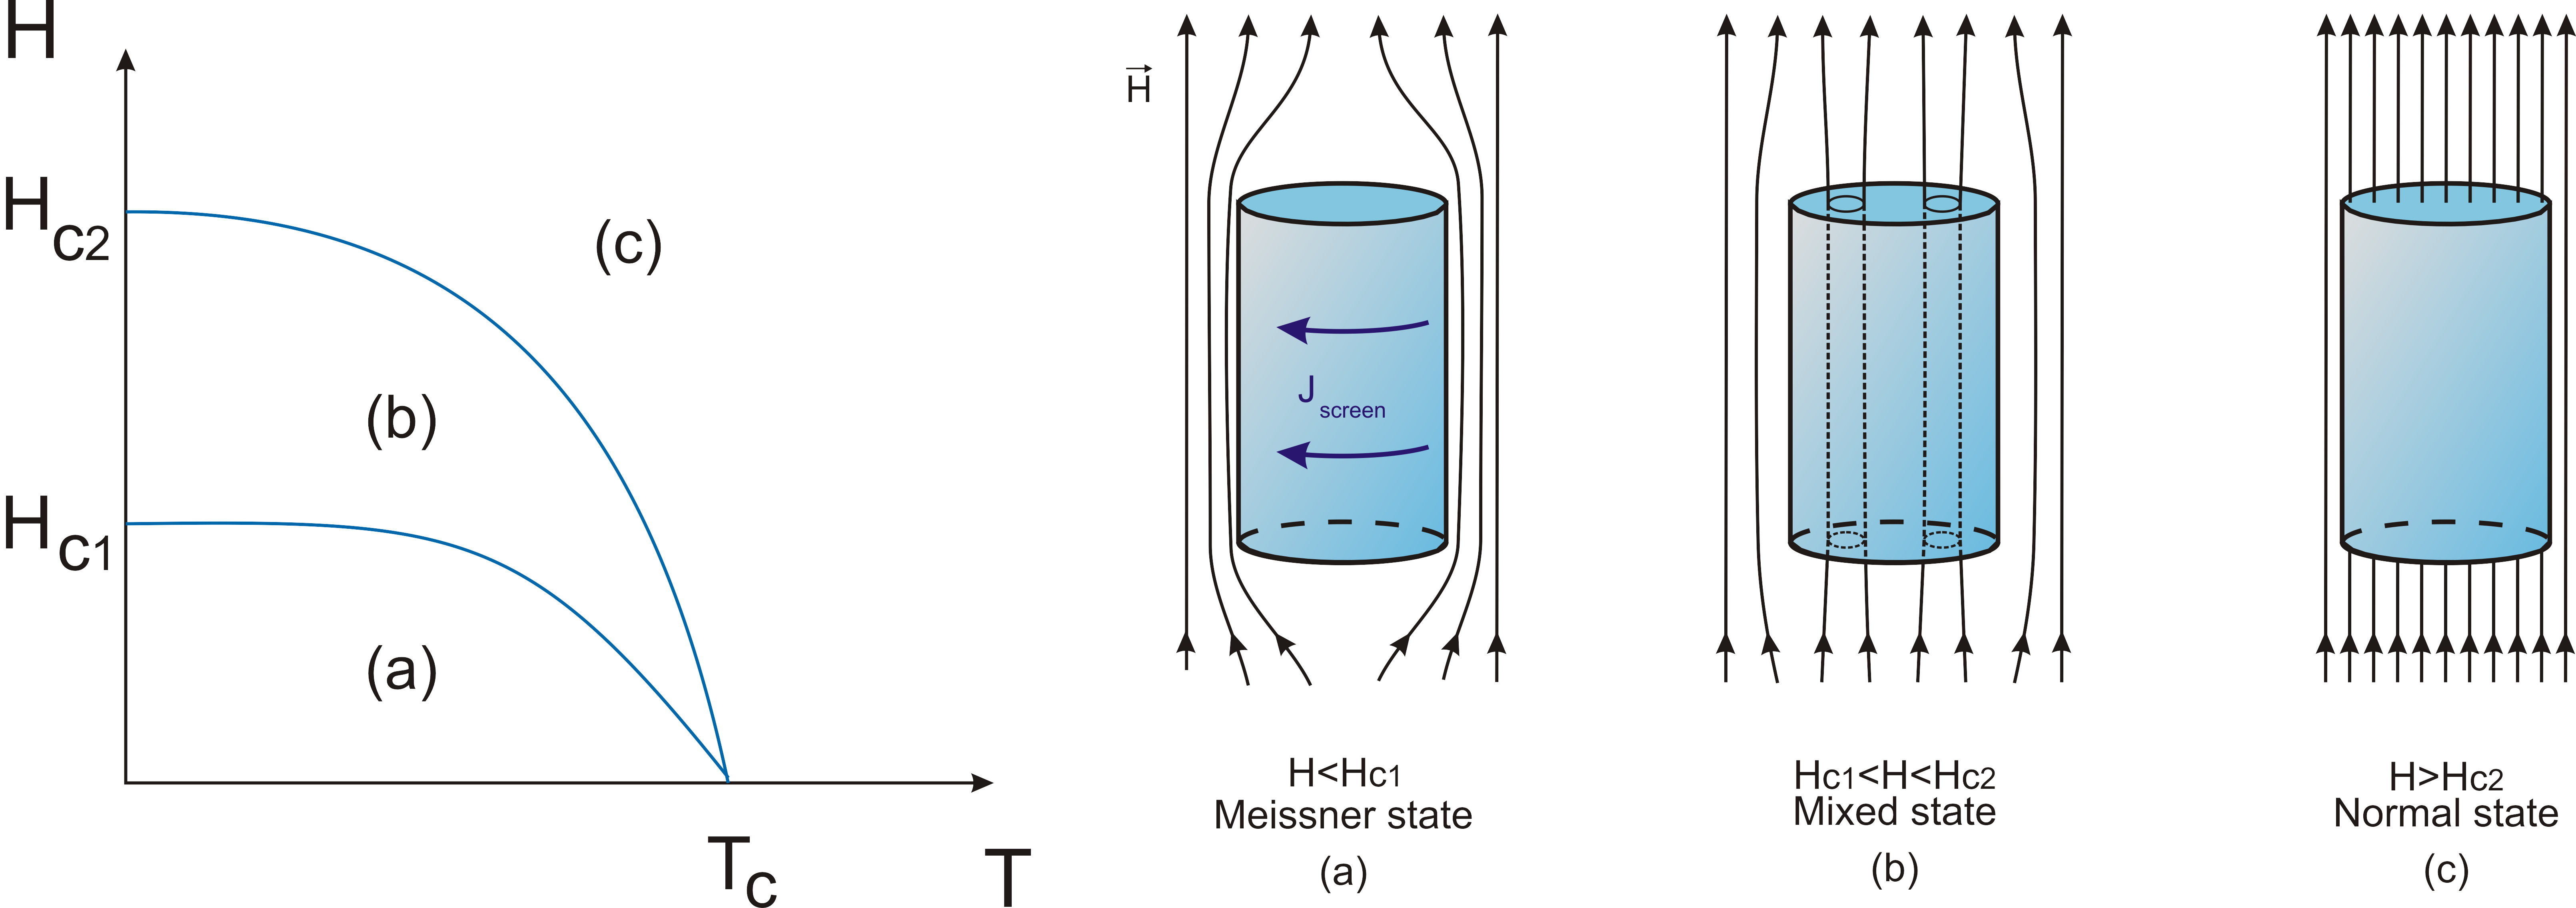 Phd thesis superconductivity